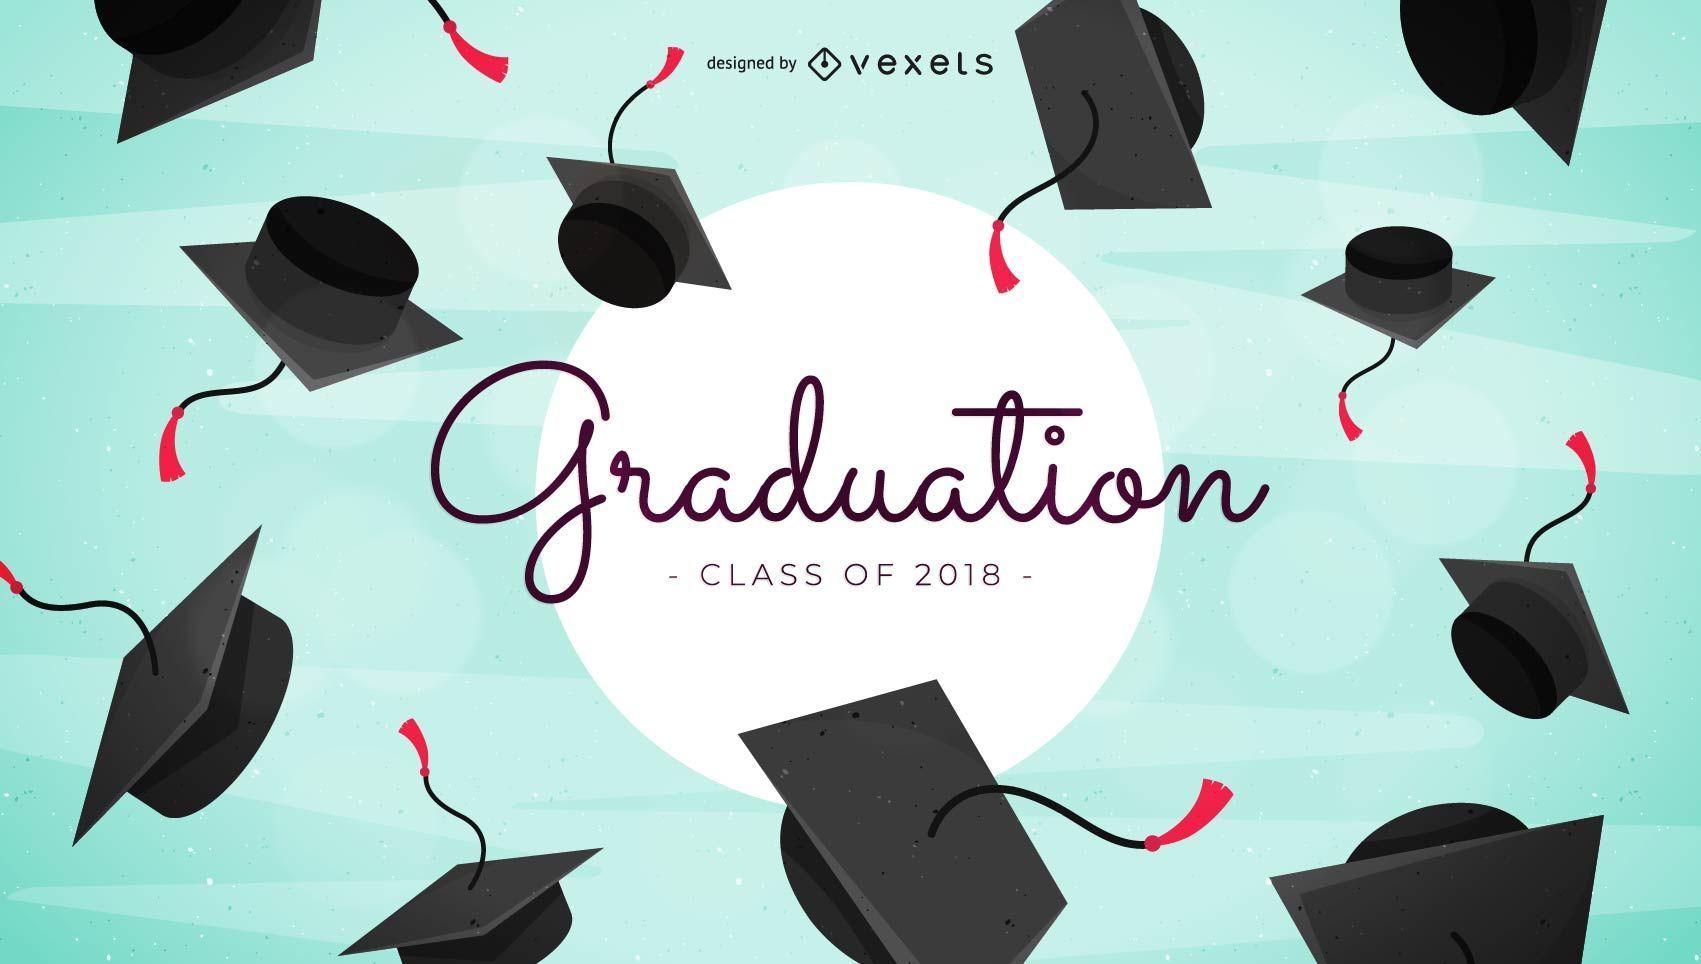 Dise?o de felicitaciones de graduaci?n